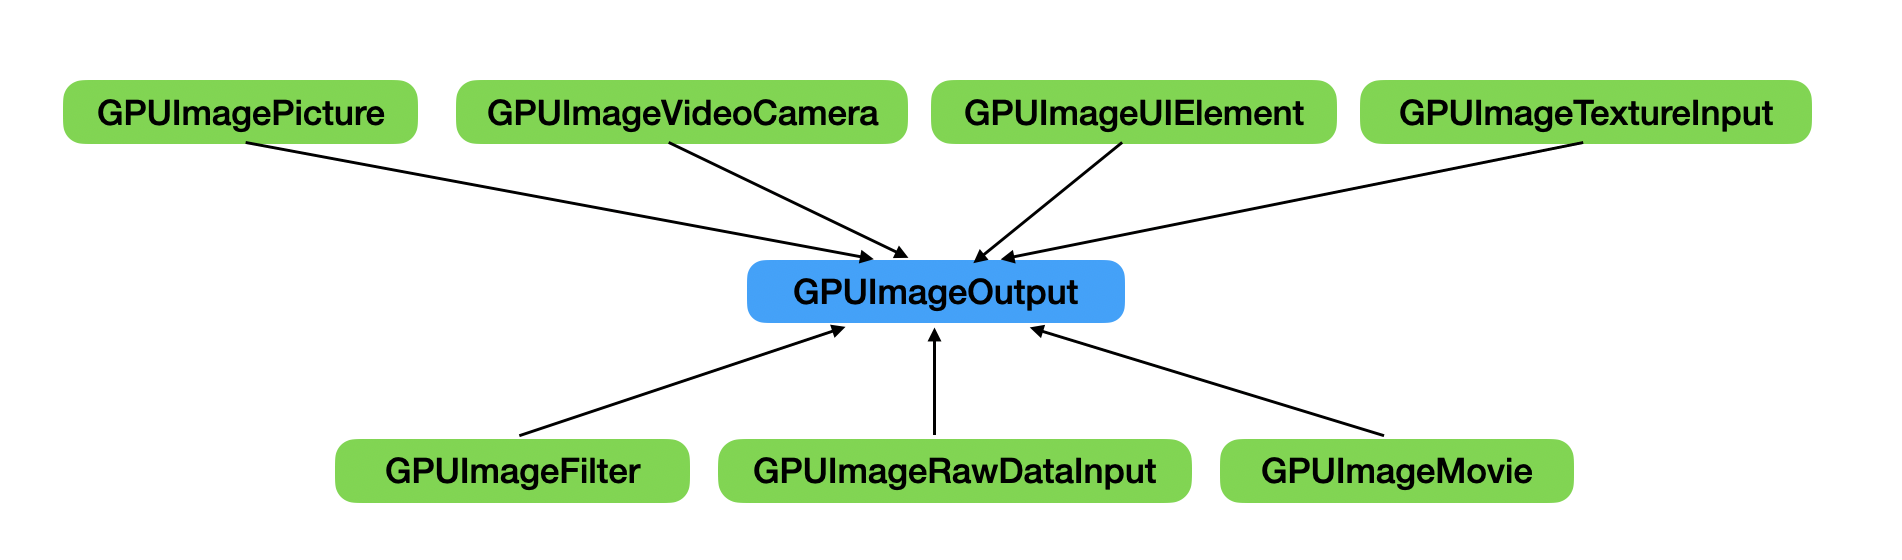 GPUImageOutput